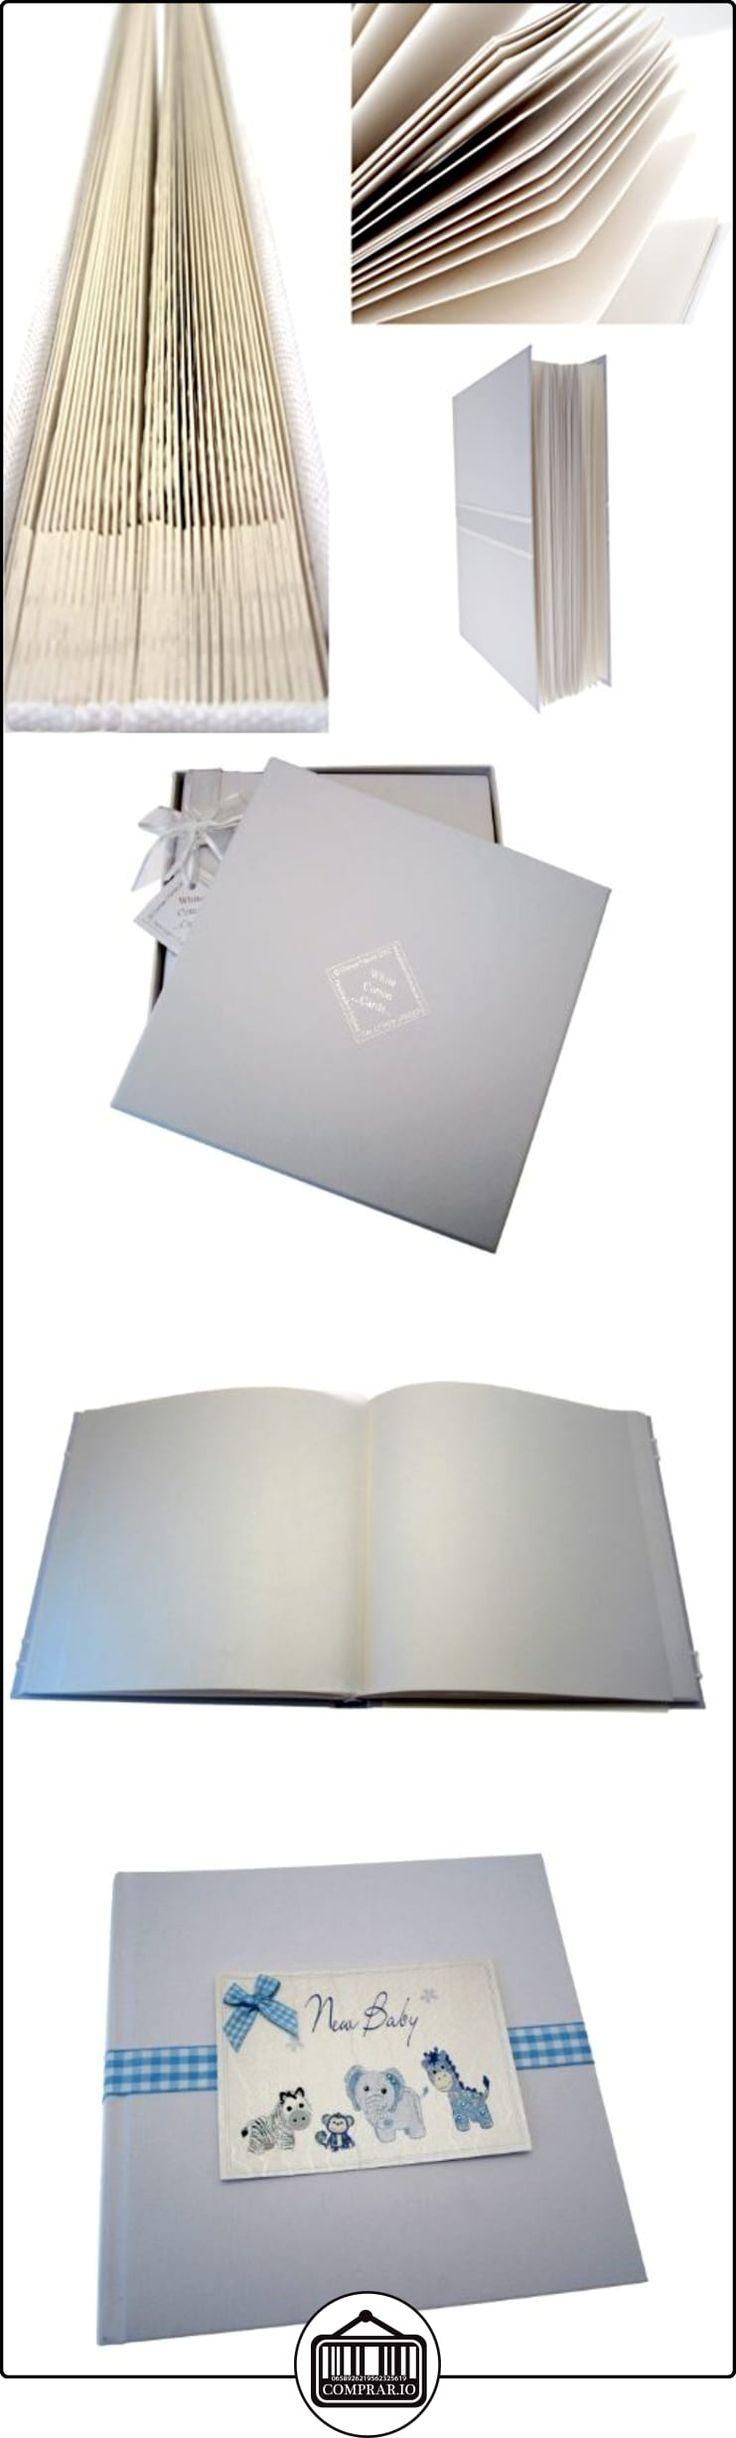 White Cotton Cards - Álbum de fotos de bebé (tamaño mediano), color azul  ✿ Regalos para recién nacidos - Bebes ✿ ▬► Ver oferta: http://comprar.io/goto/B00DQSQ6T2